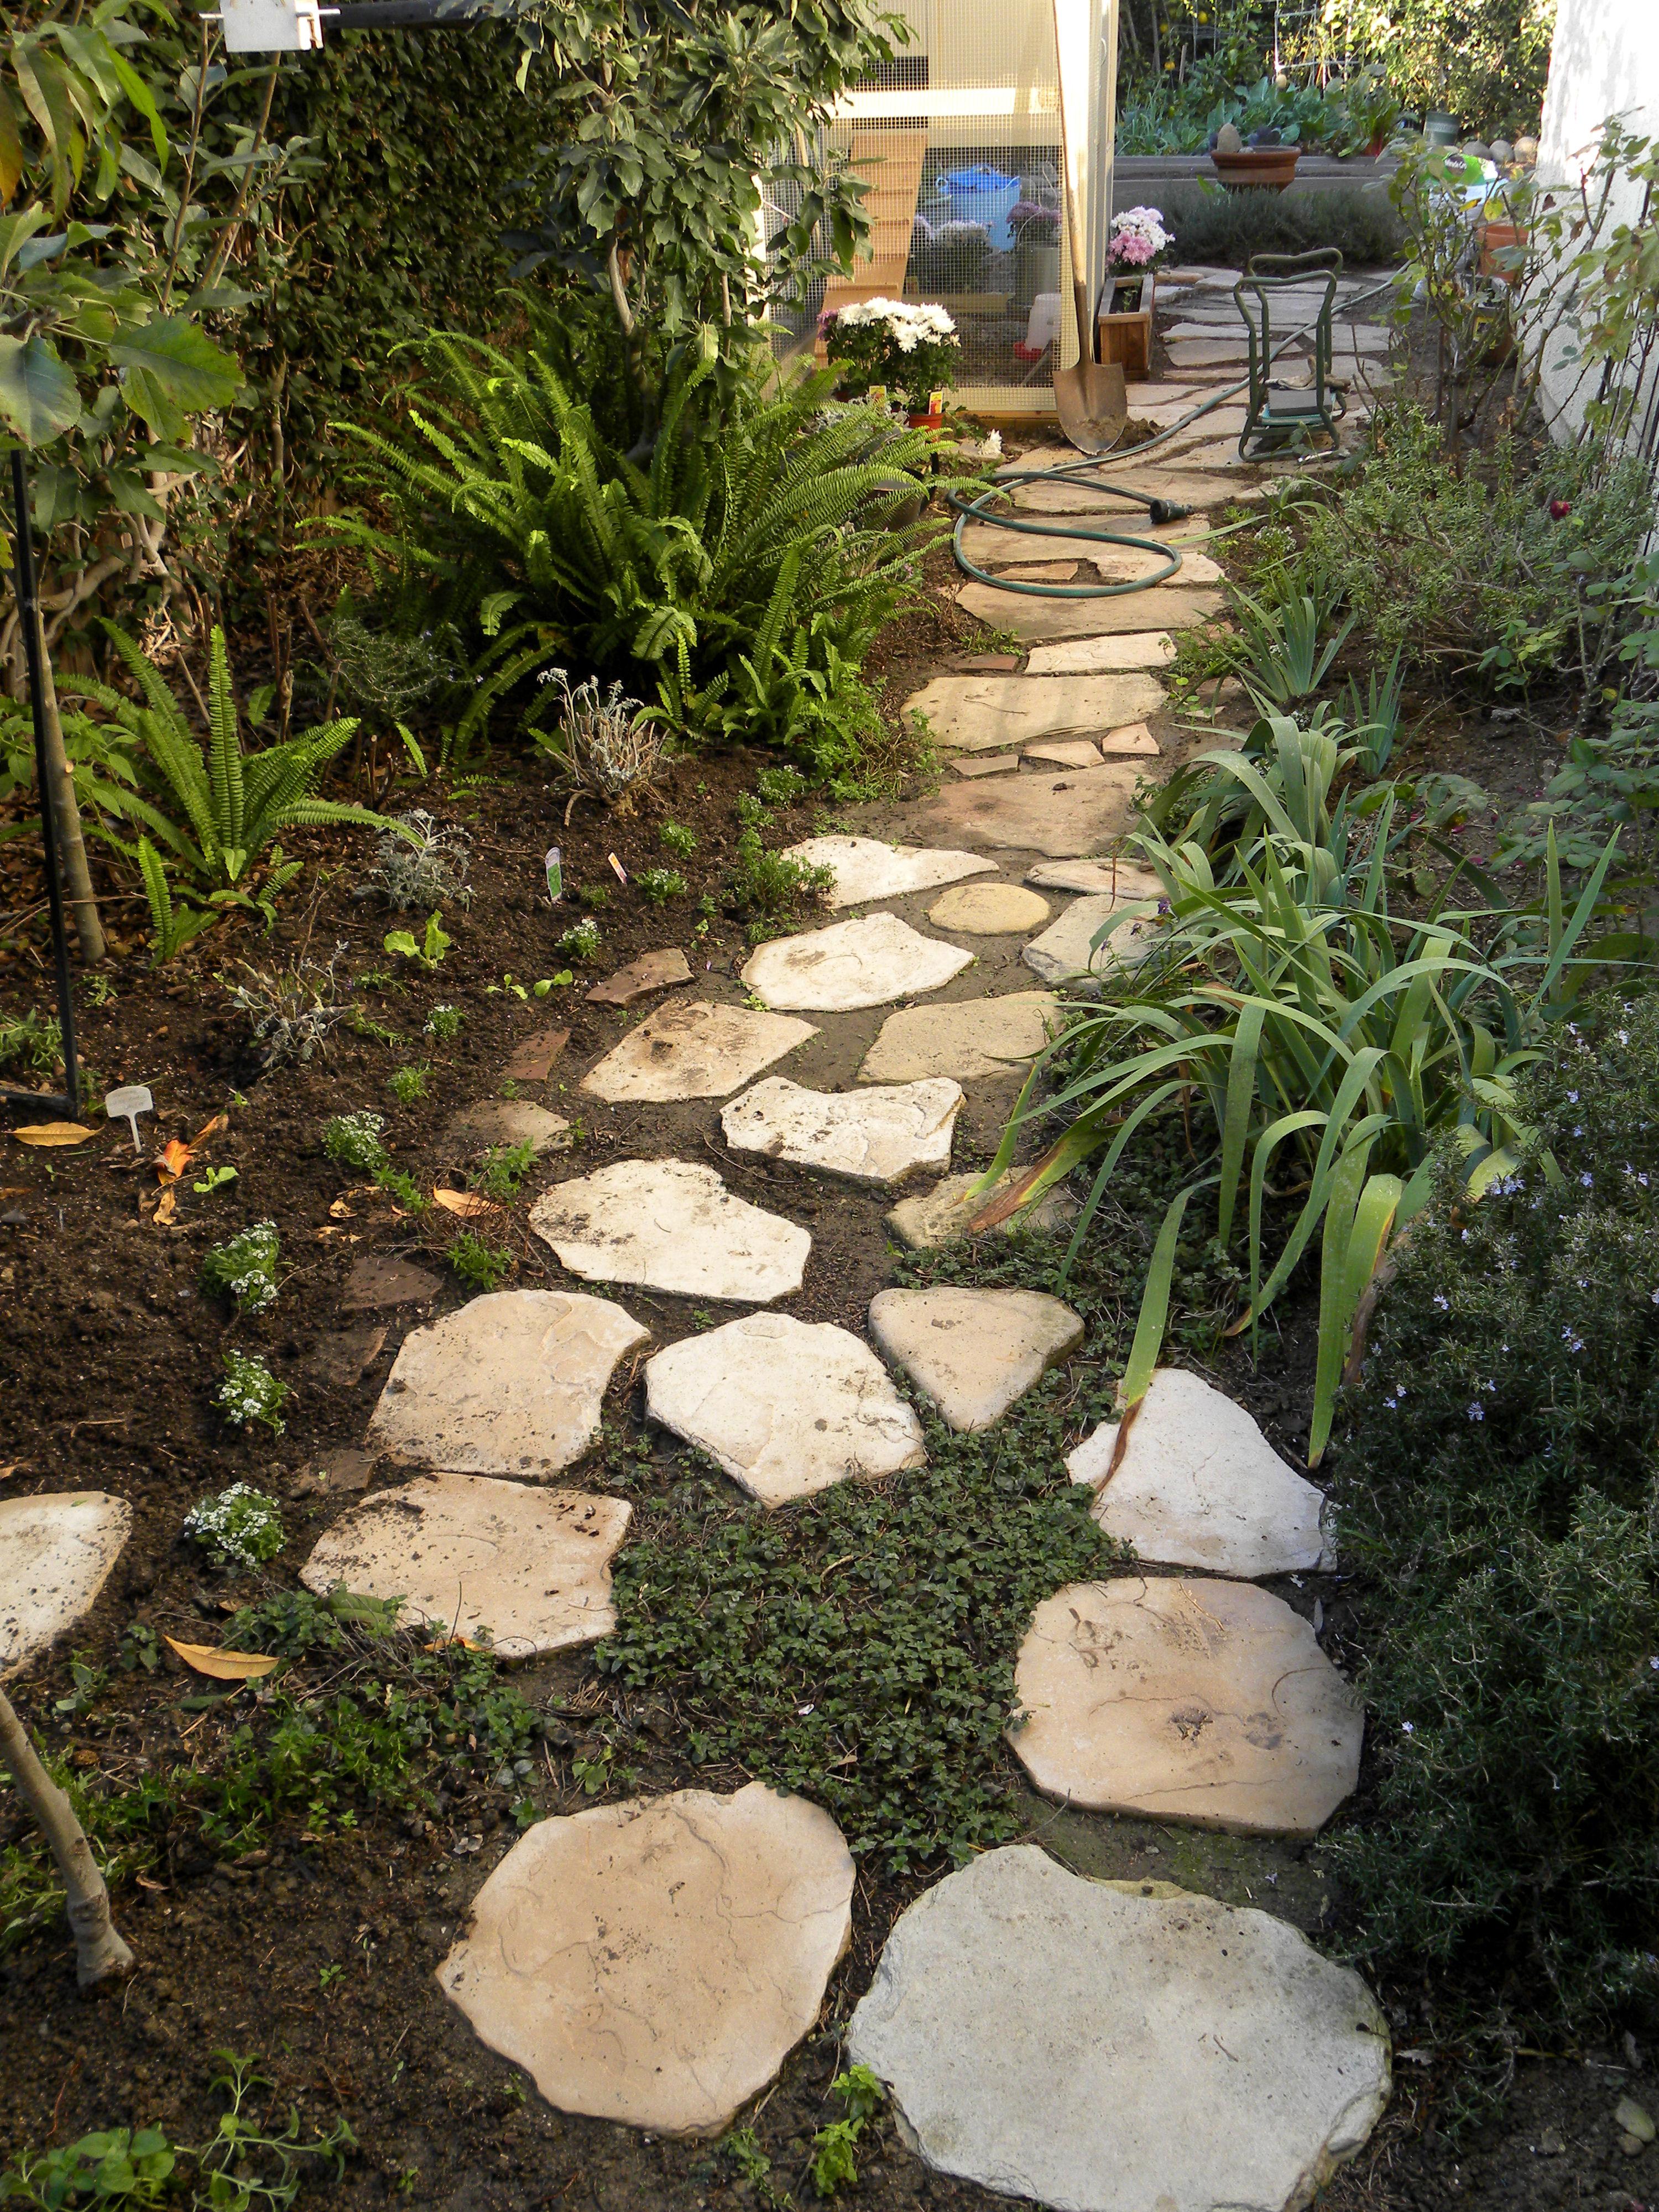 revamped pathway